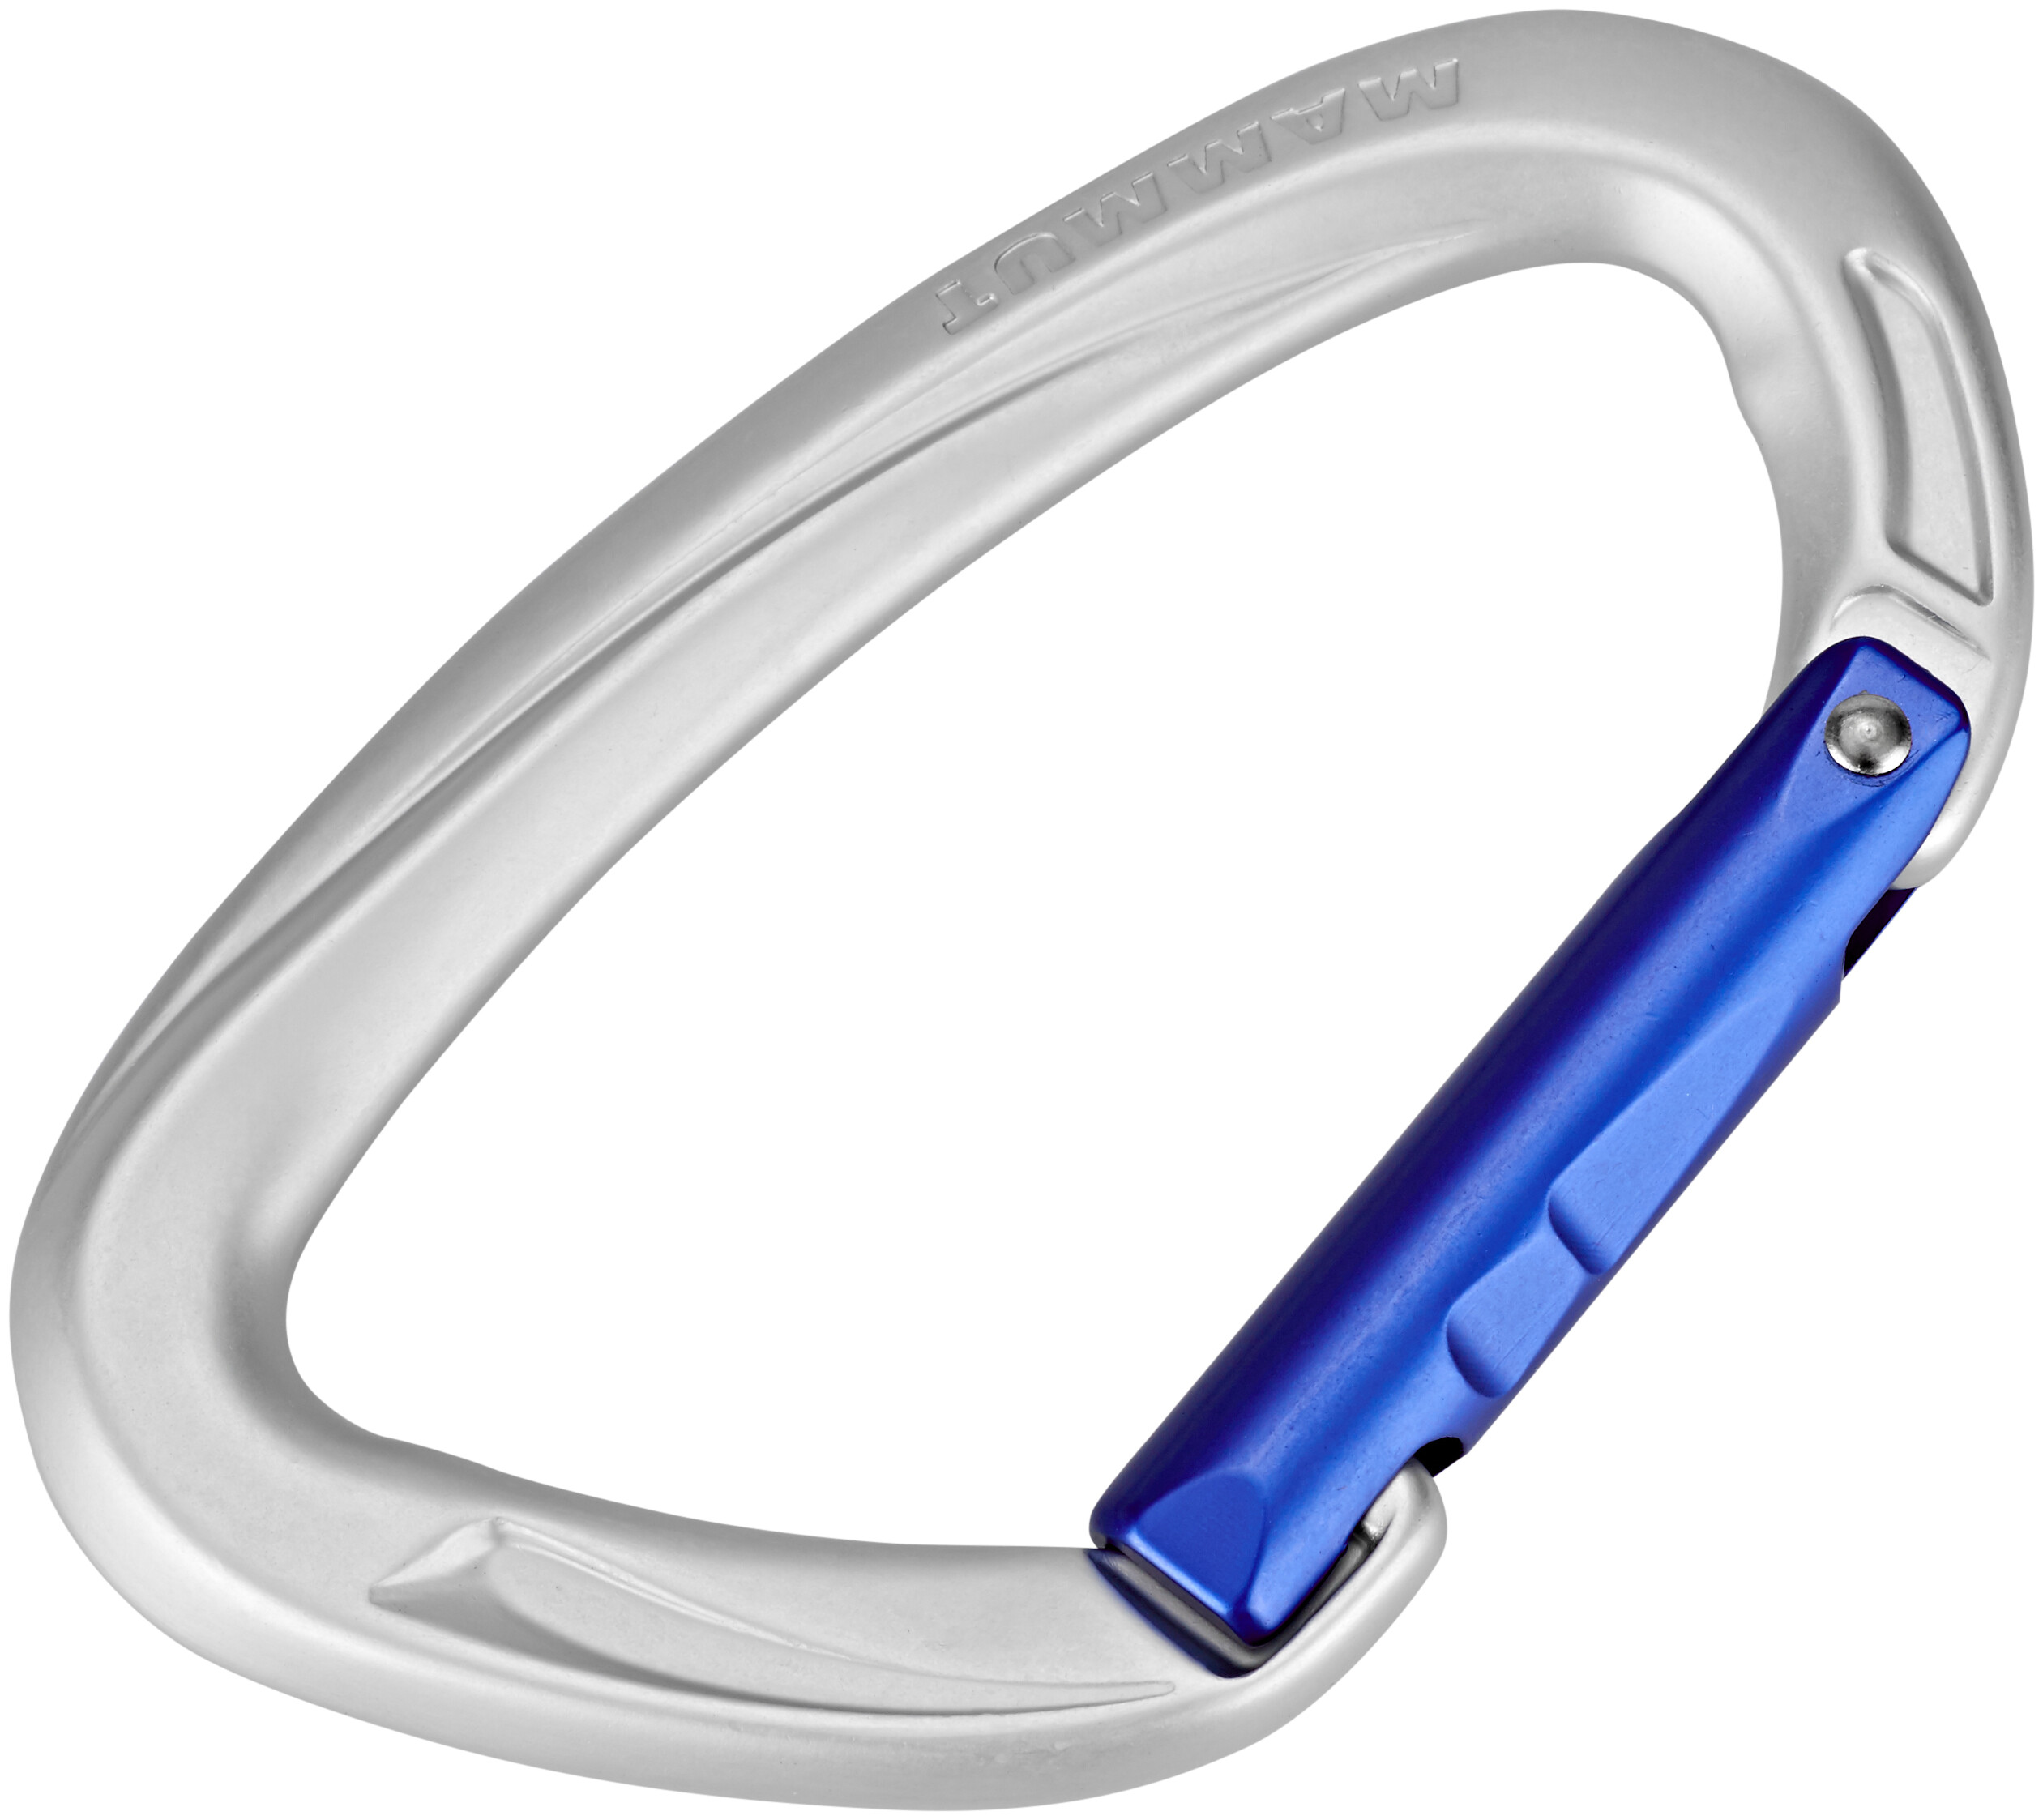 Silver CAMP Orbit Straight Gate Carabiner